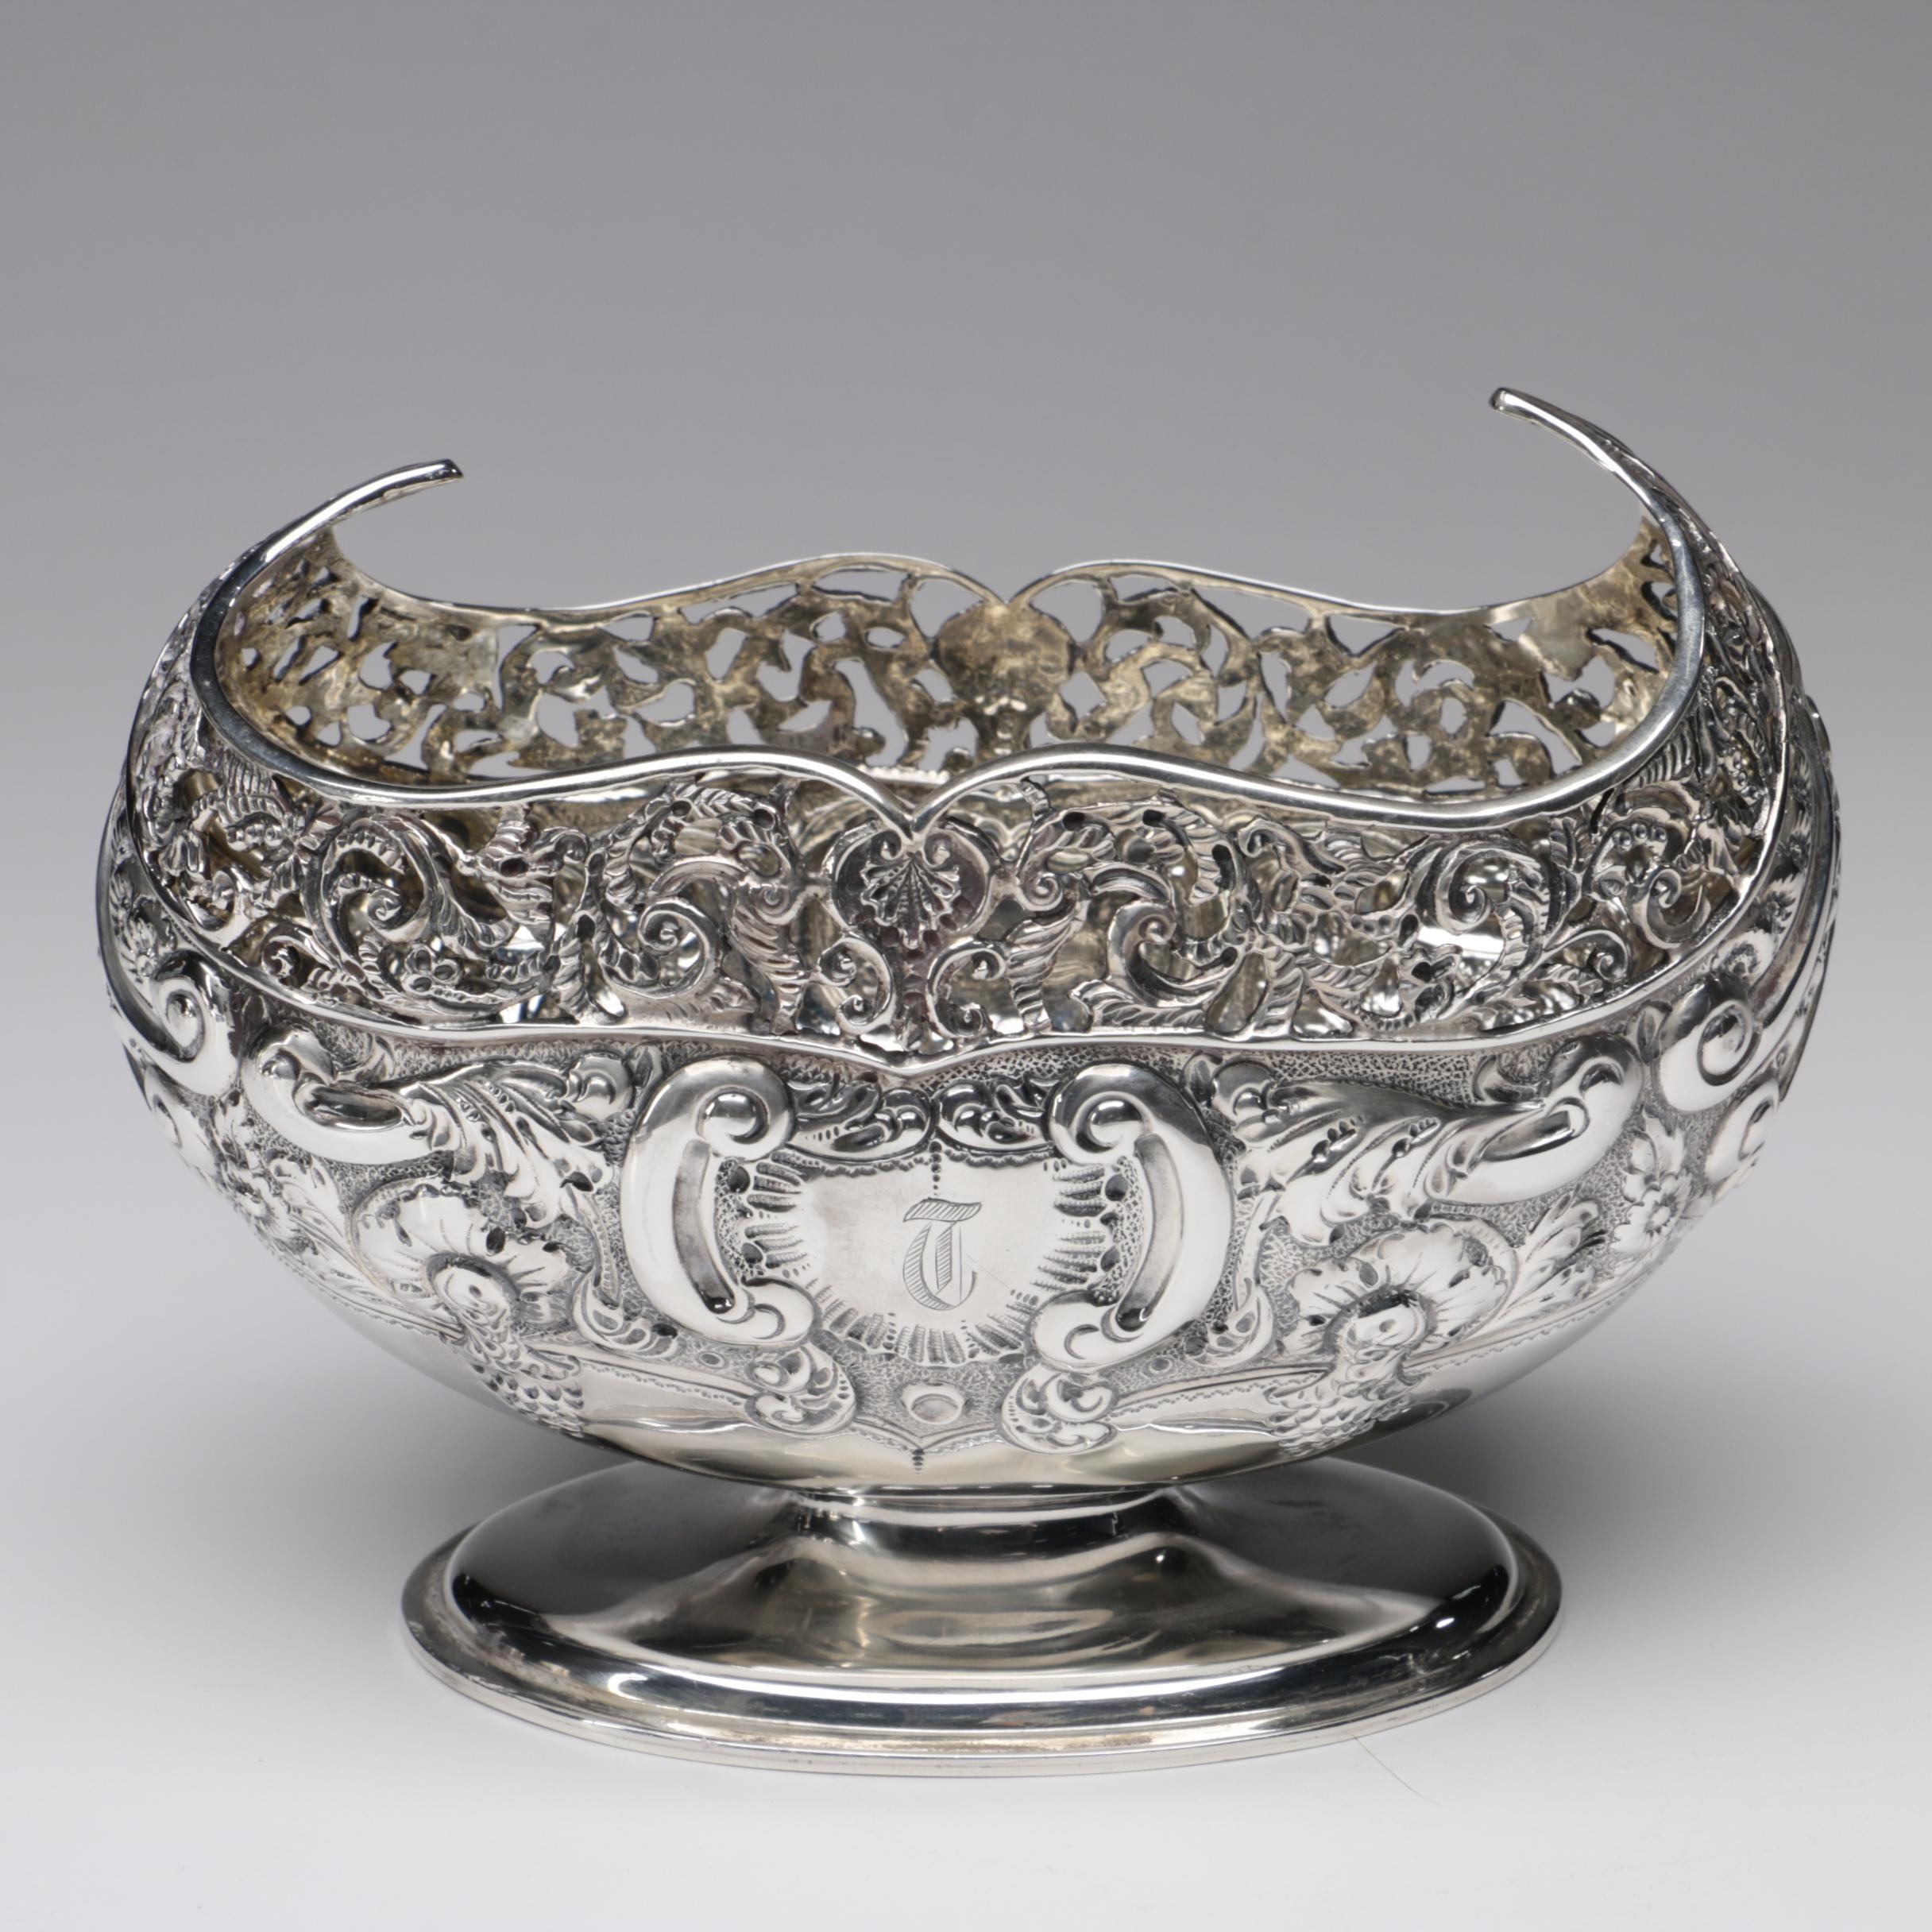 Josiah Williams & Co Sterling Silver Centerpiece, 1903